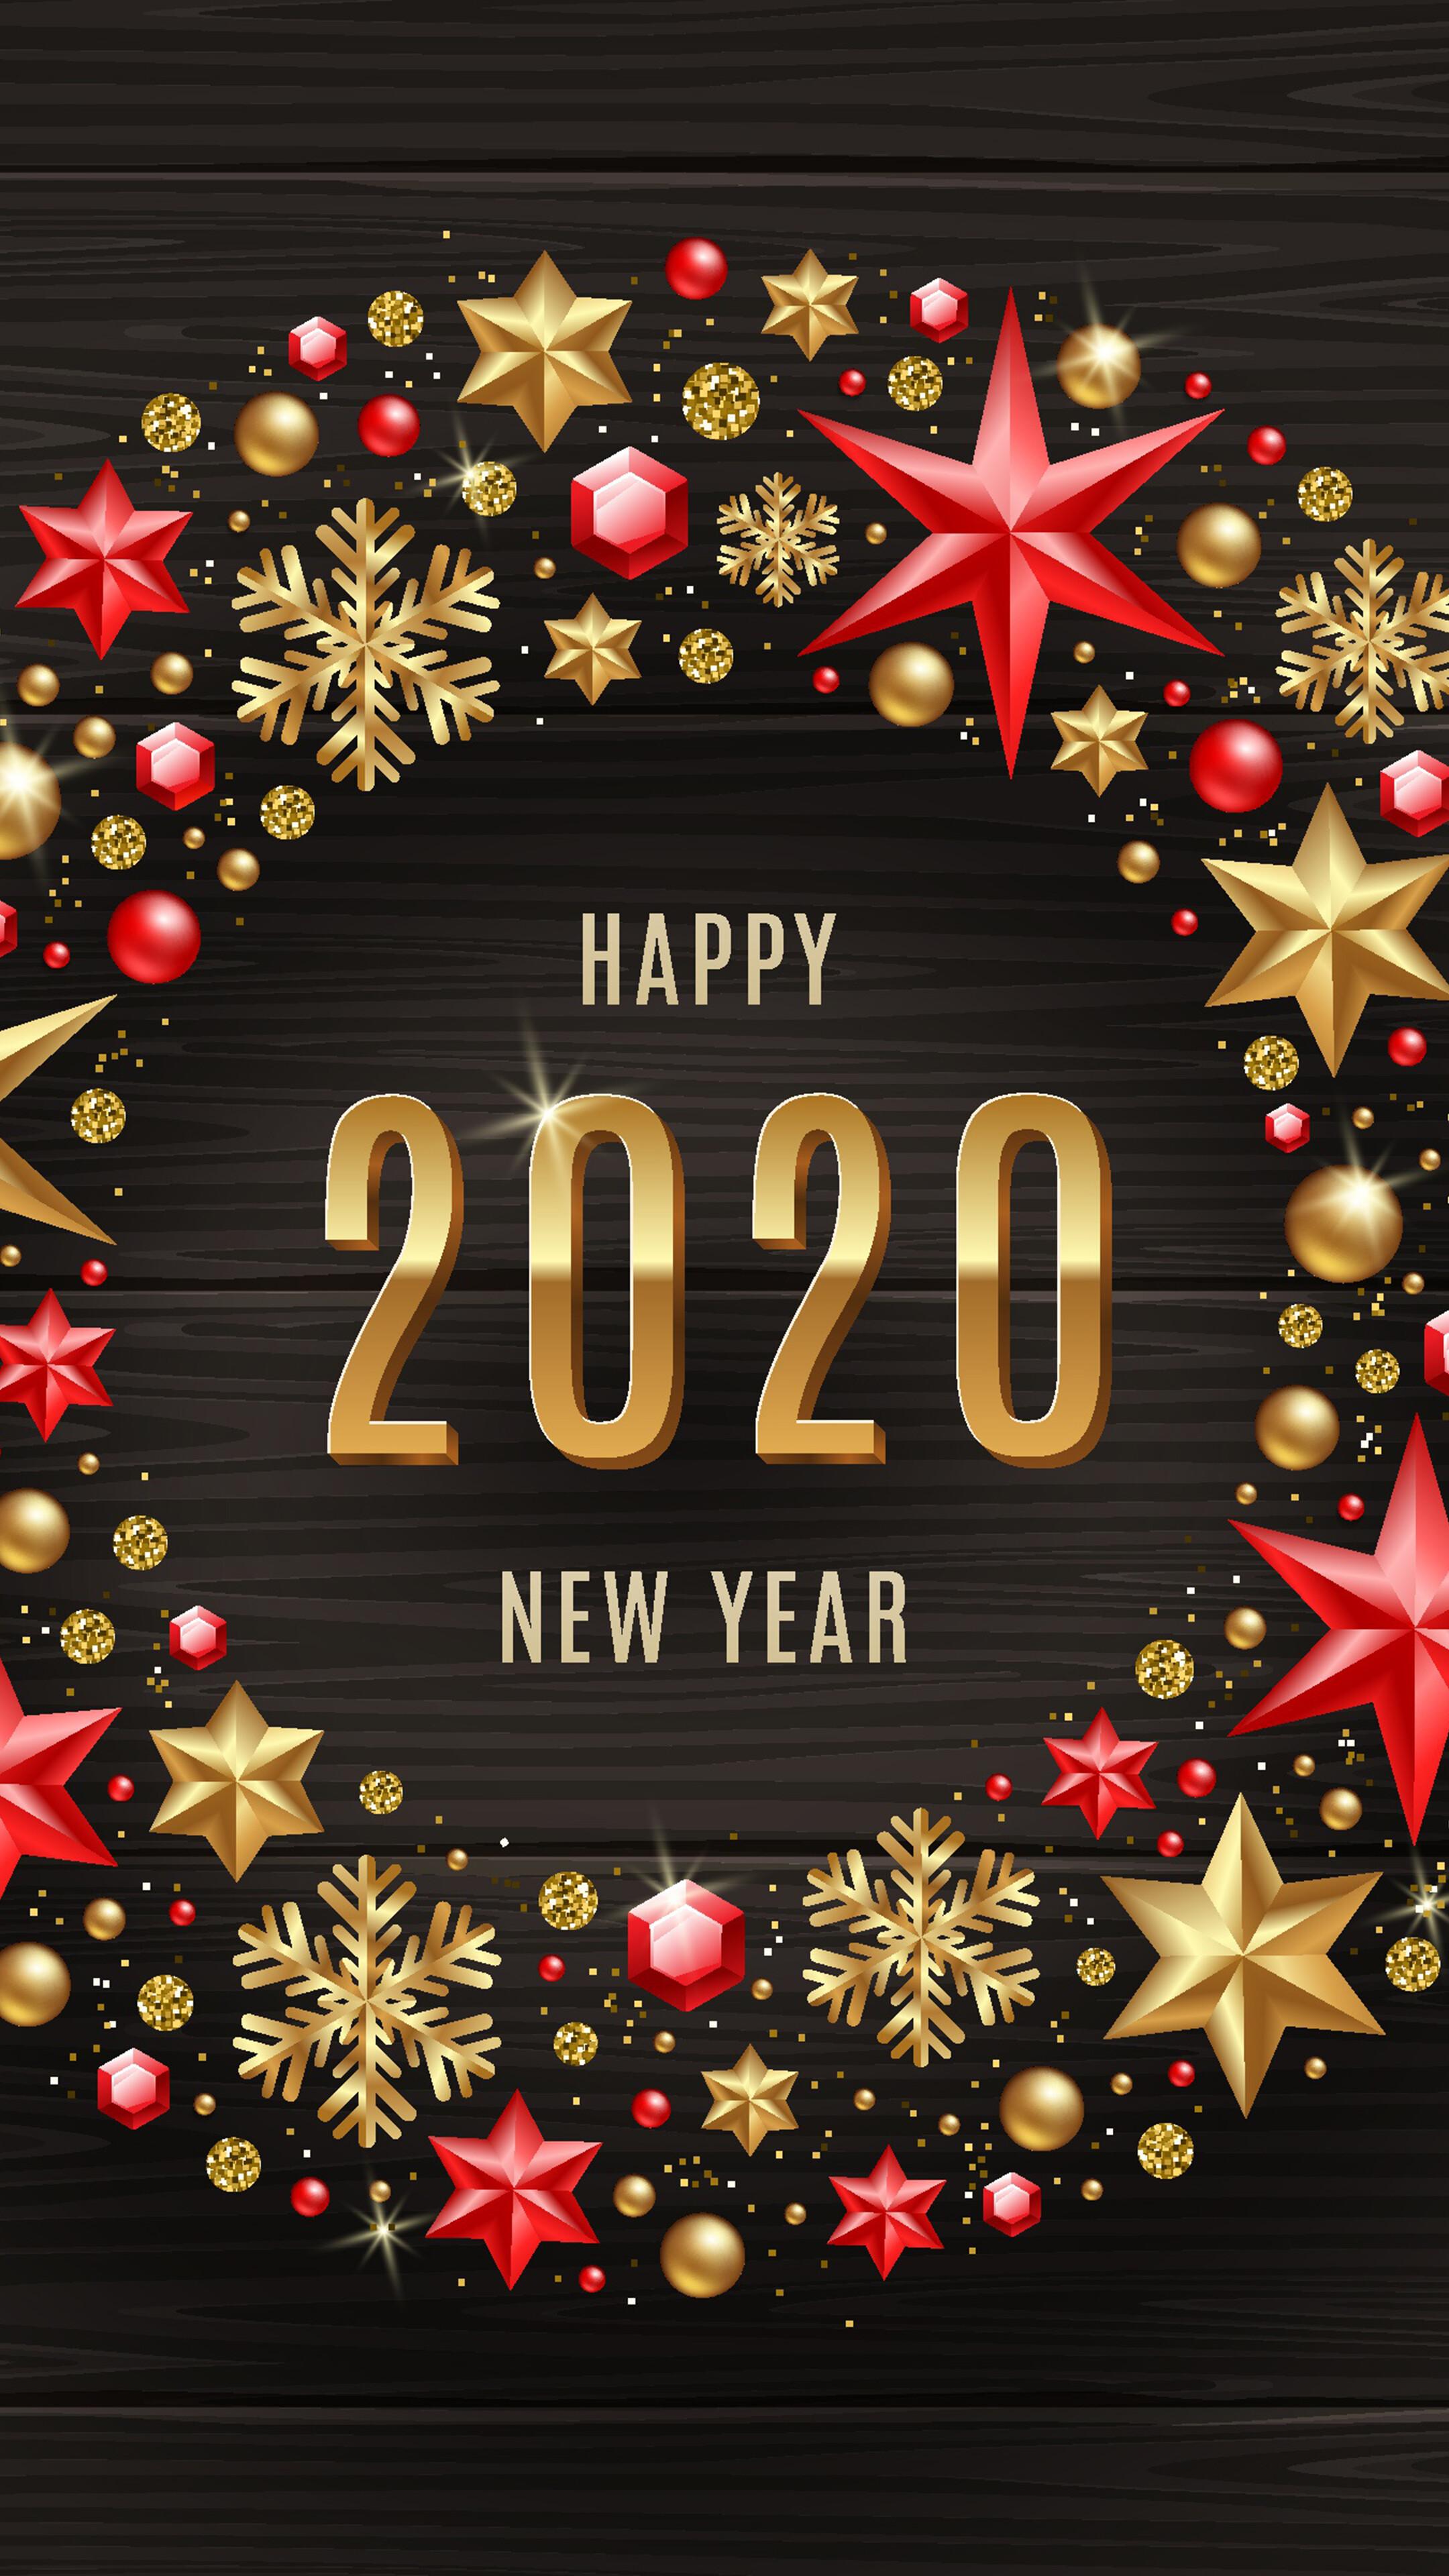 Happy 2020 New Year 4K Wallpaper 42307 2160x3840